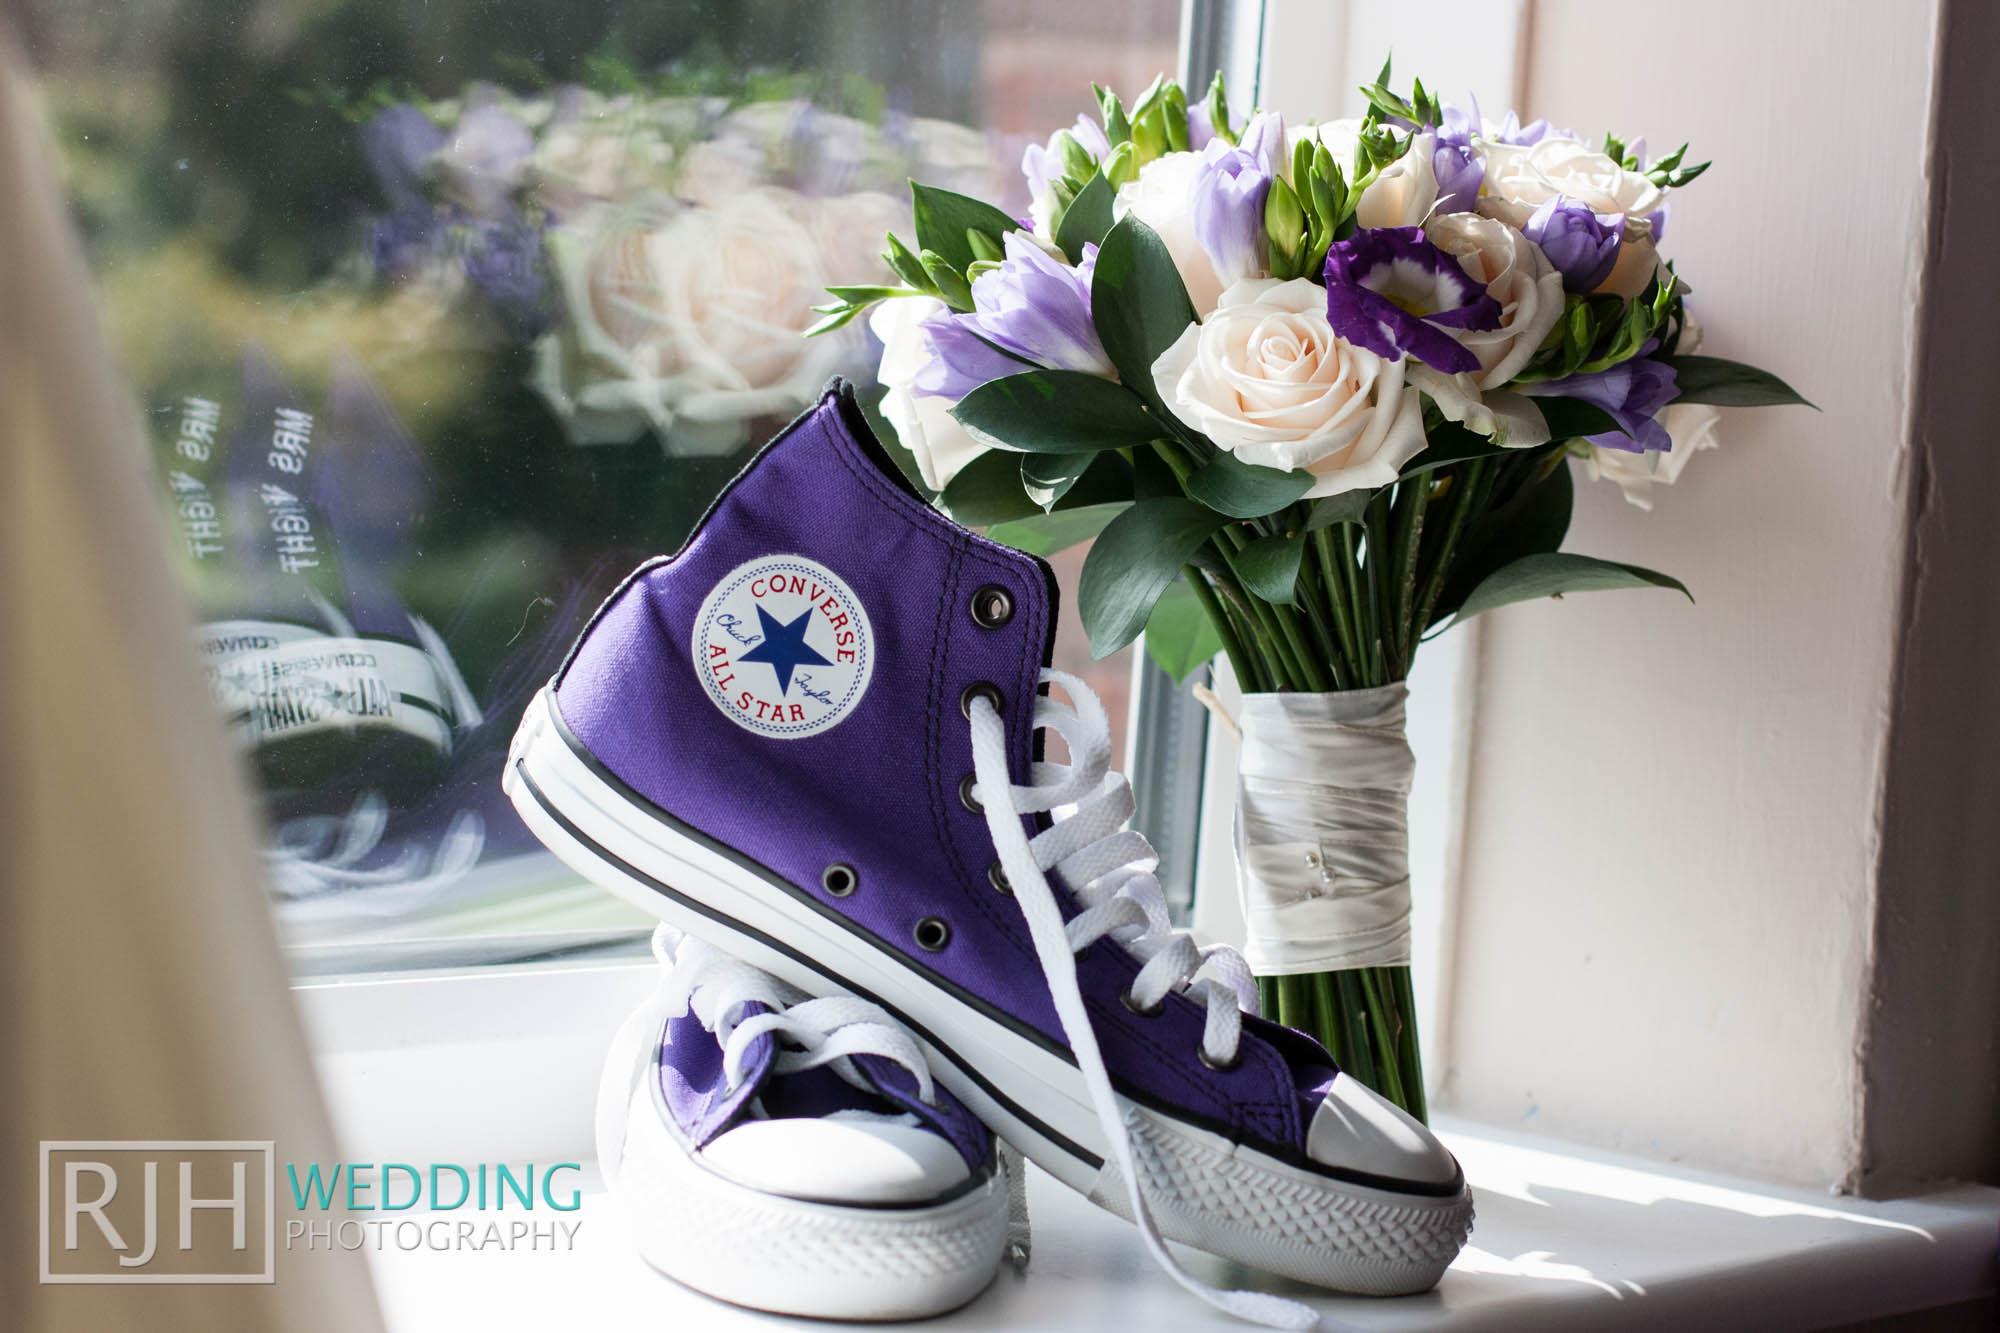 RJH Wedding Photography_2014 highlights_42.jpg